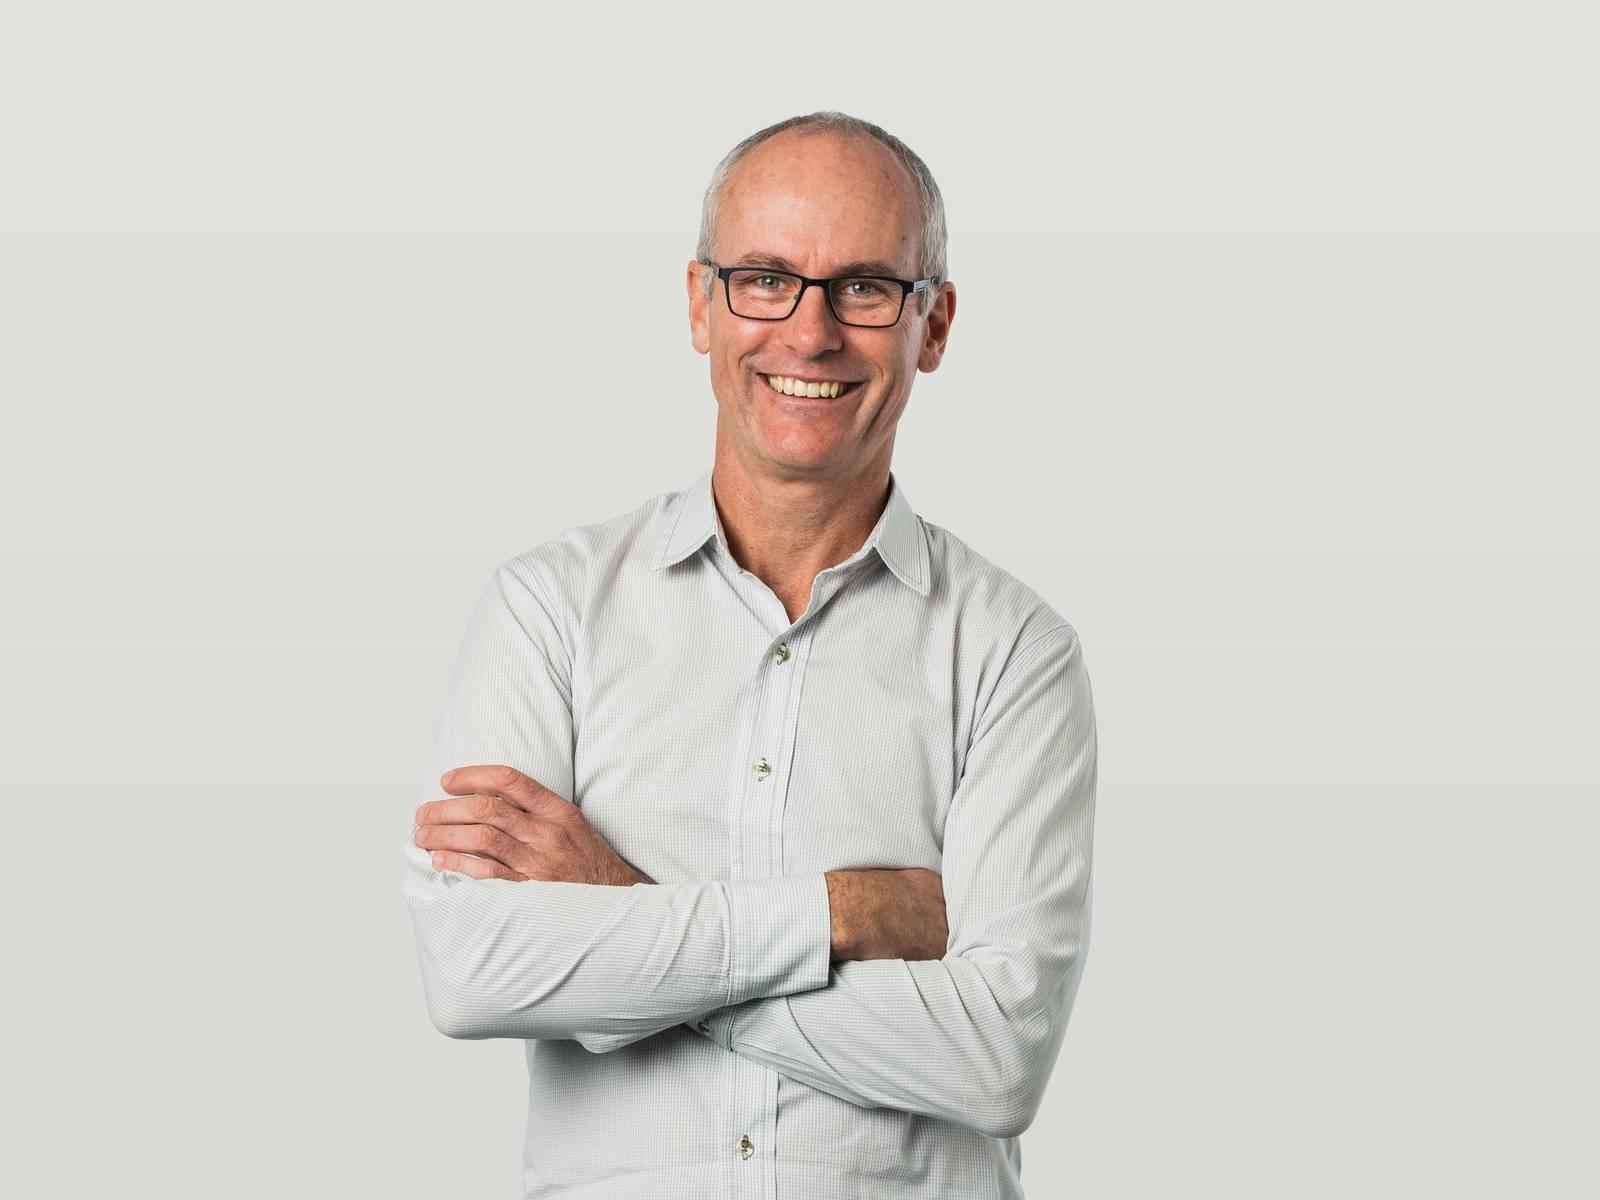 A profile image of Carl Steward